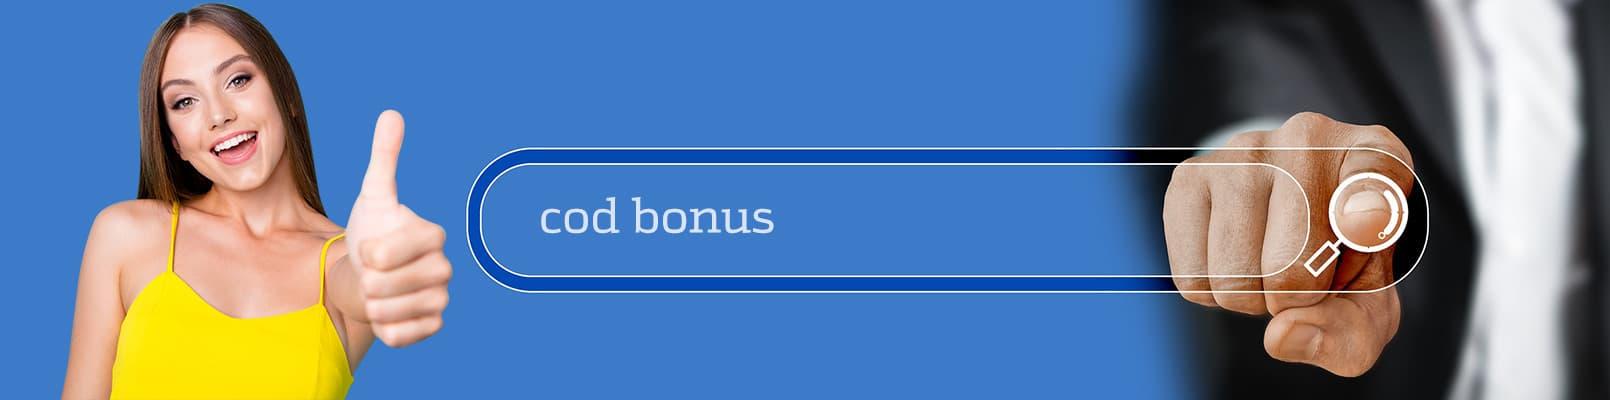 cod bonus